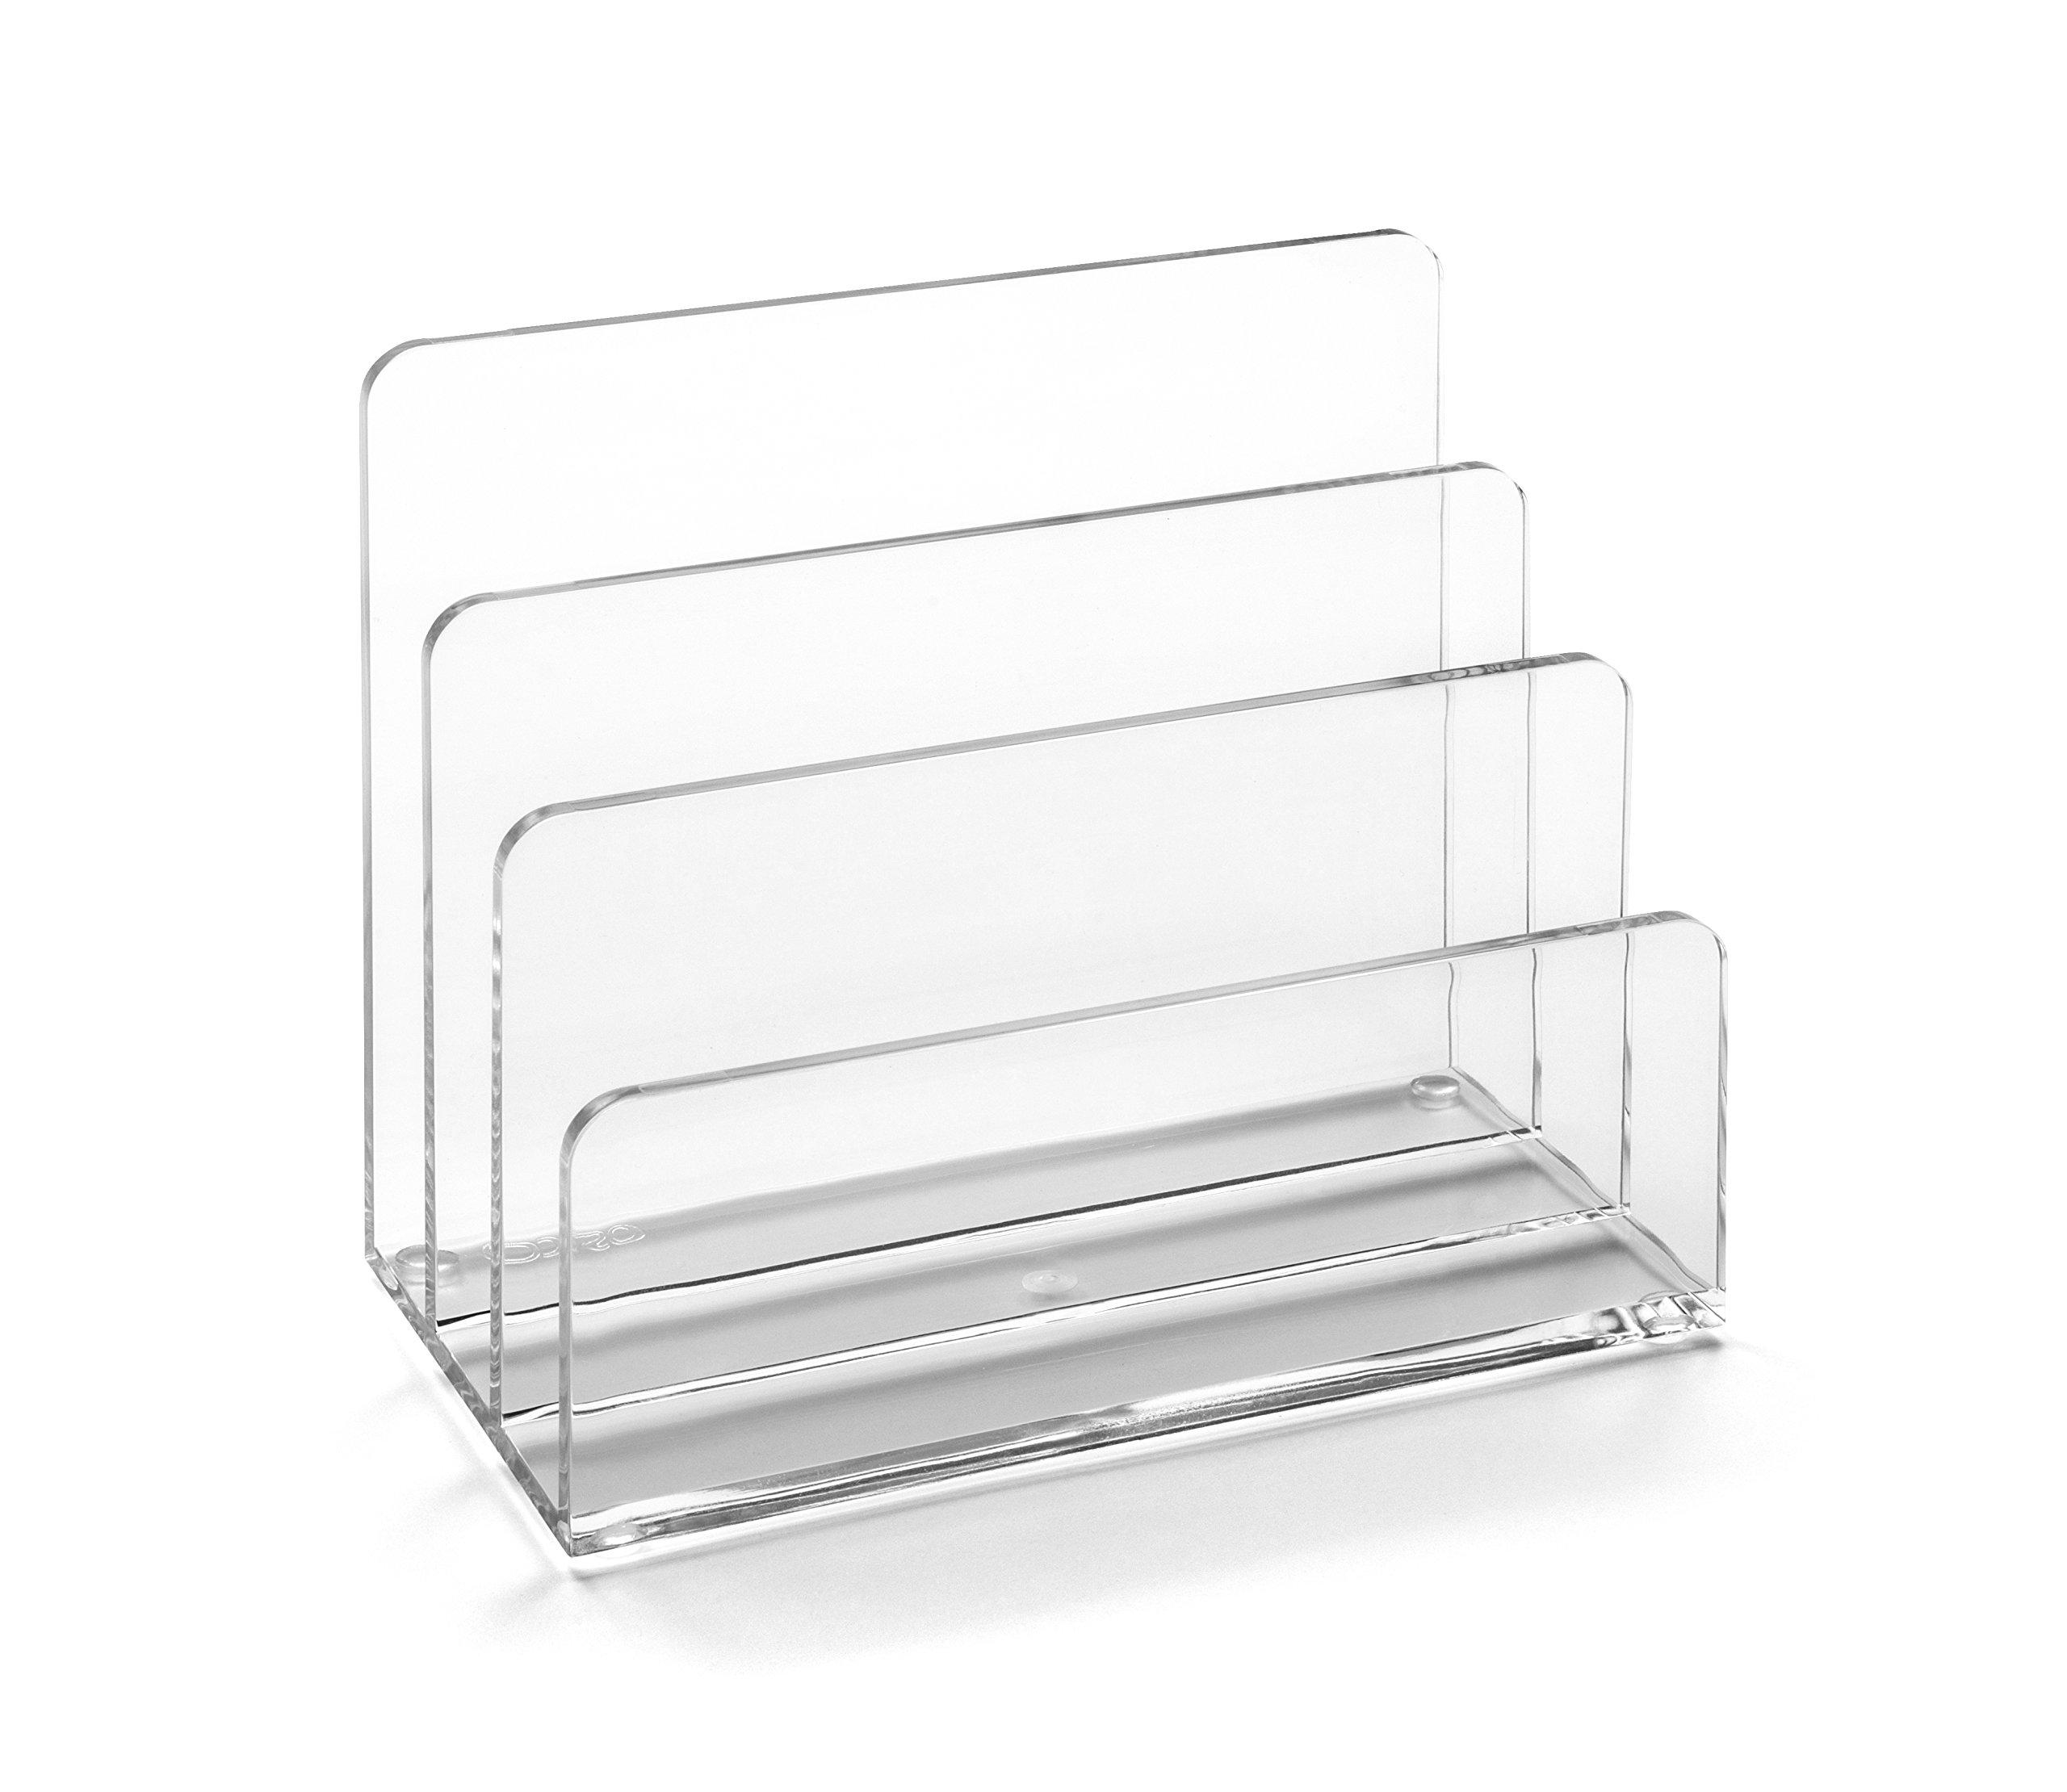 Osco ALH1 - Soporte para correspondencia acrílico, diseño transparente product image